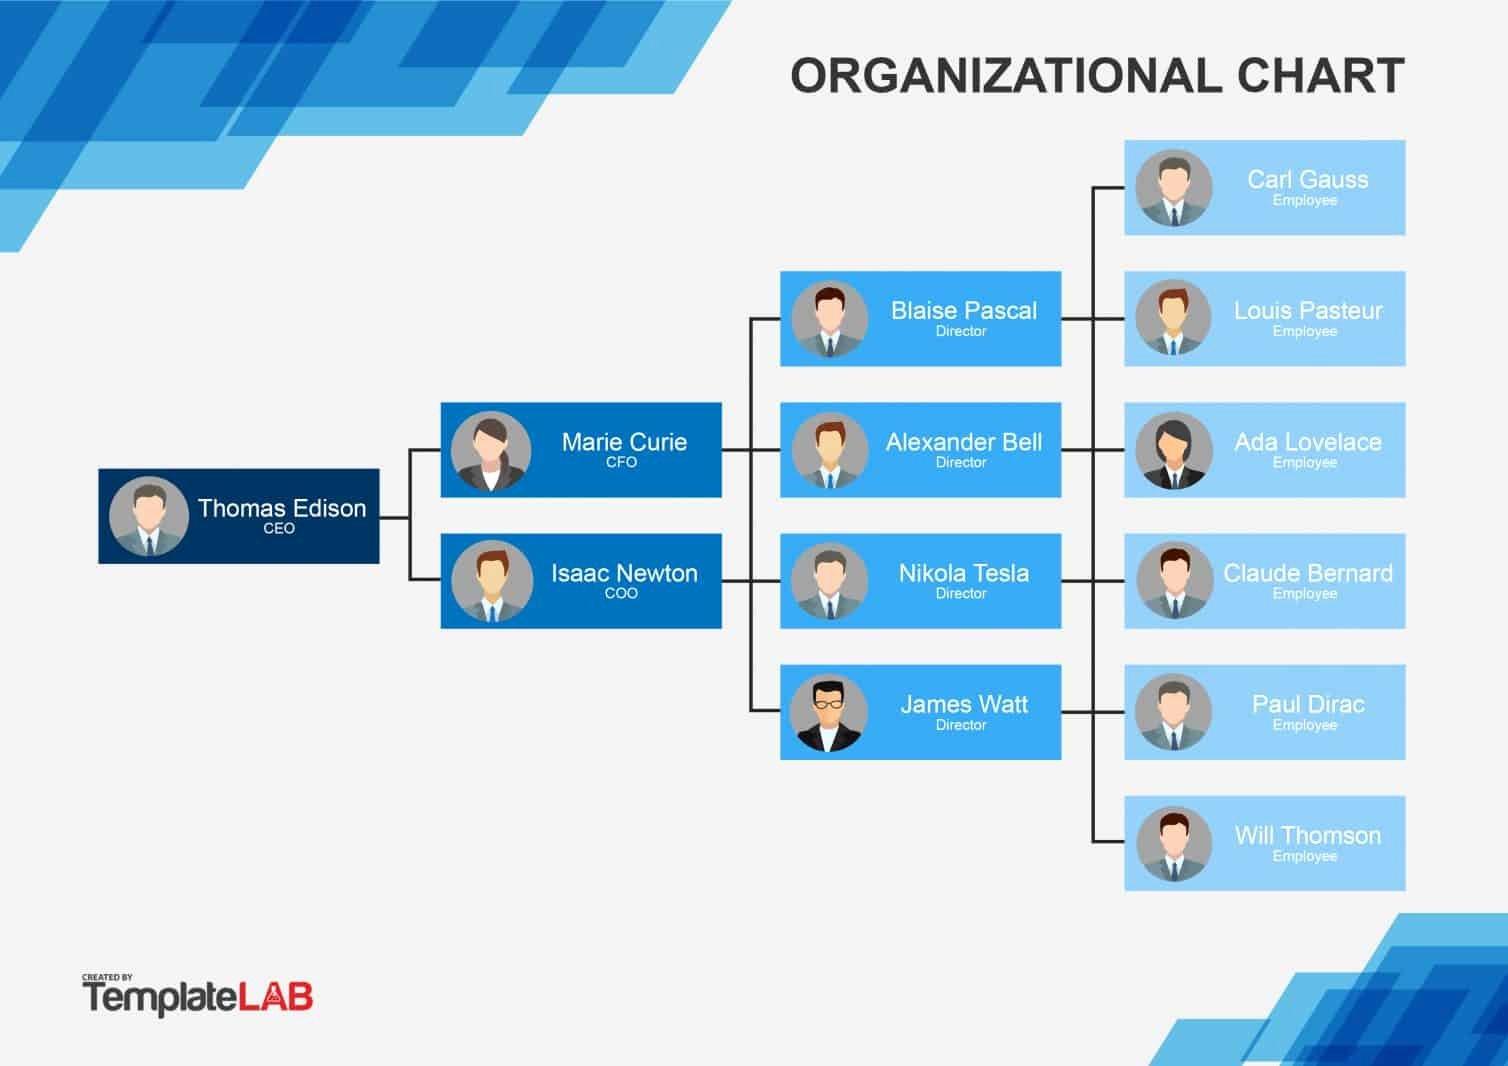 Organizational Chart Template Free Awesome 40 organizational Chart Templates Word Excel Powerpoint